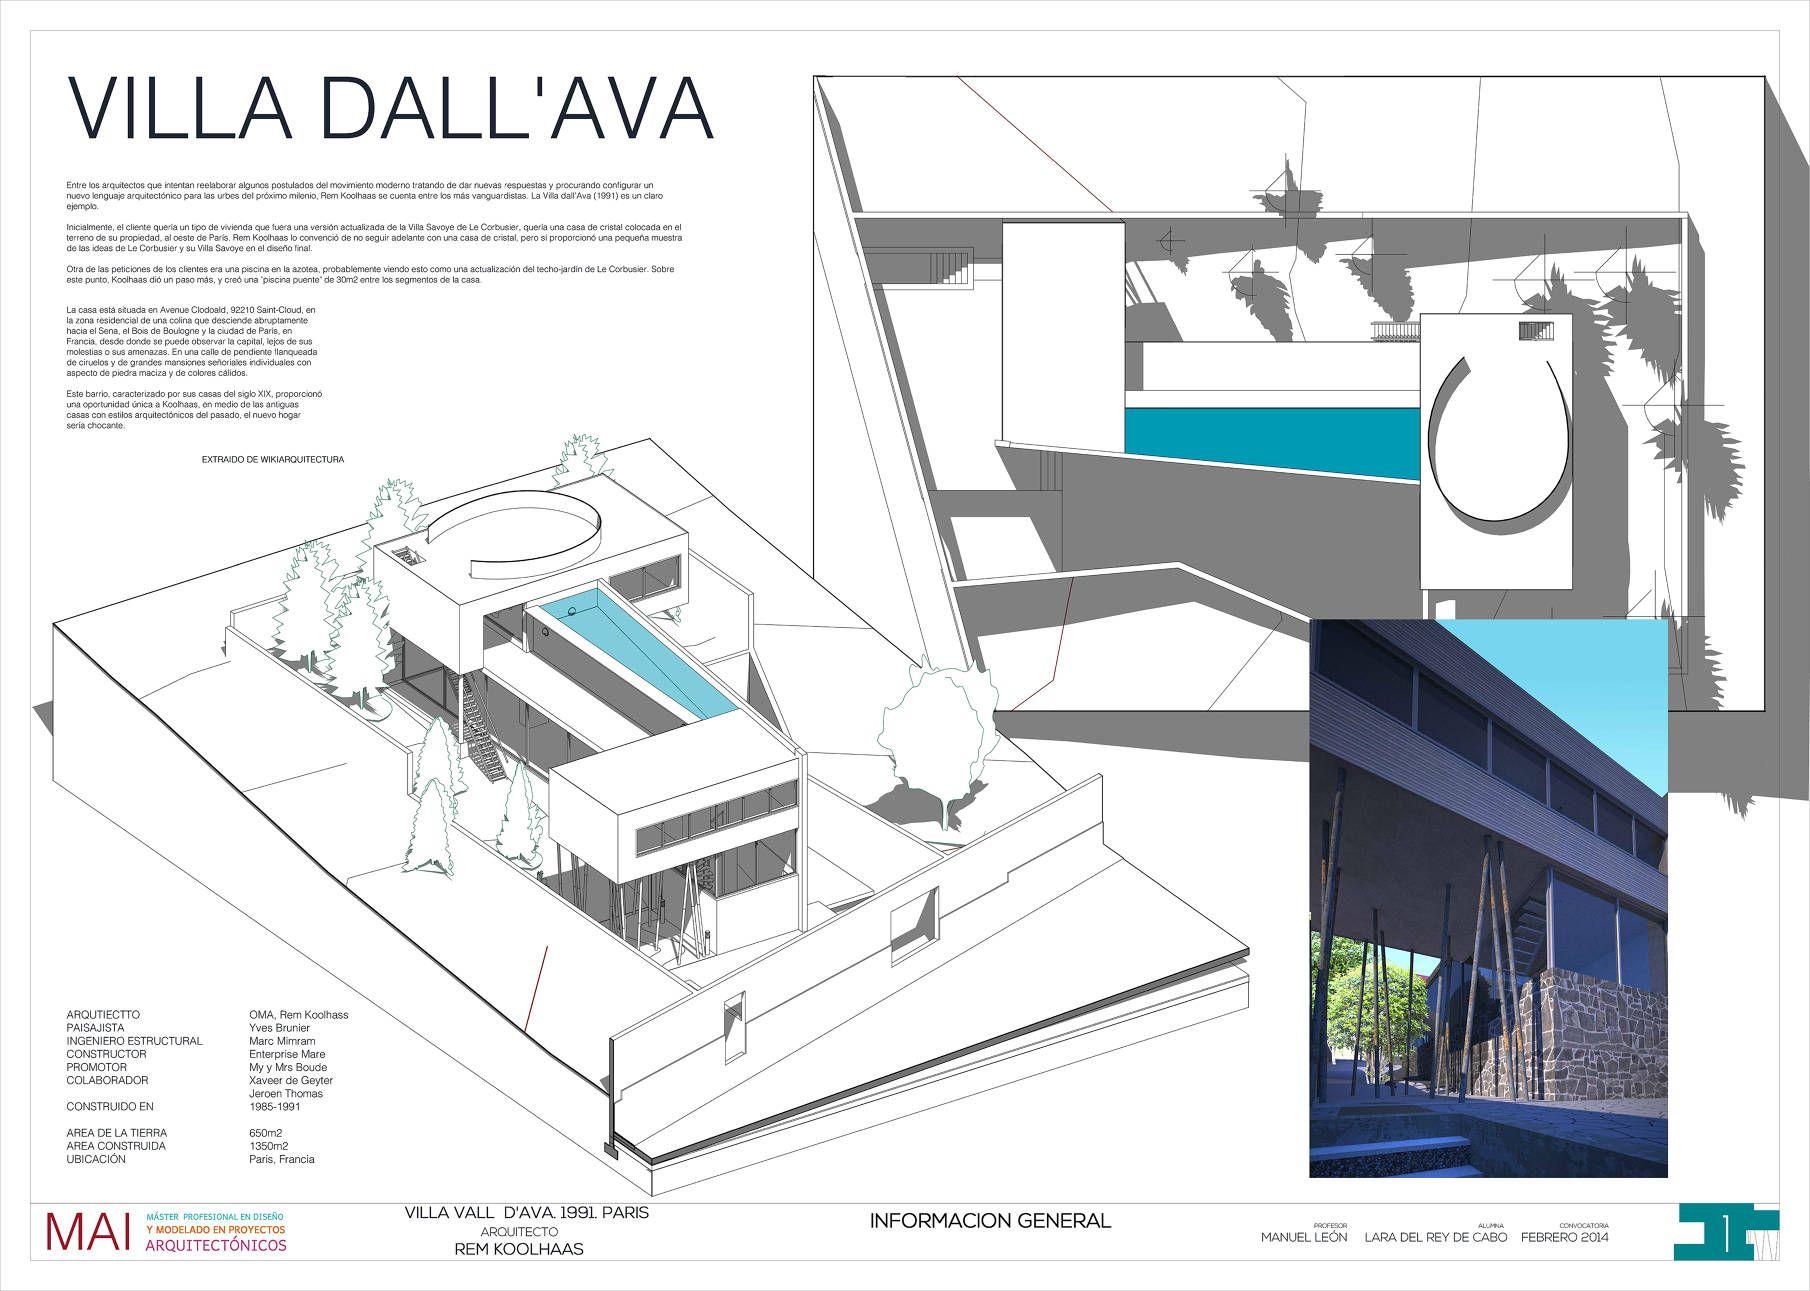 Rem koolhaas villa dall ava paris france 1991 atlas of - Villa Dall Ava Lara Del Rey